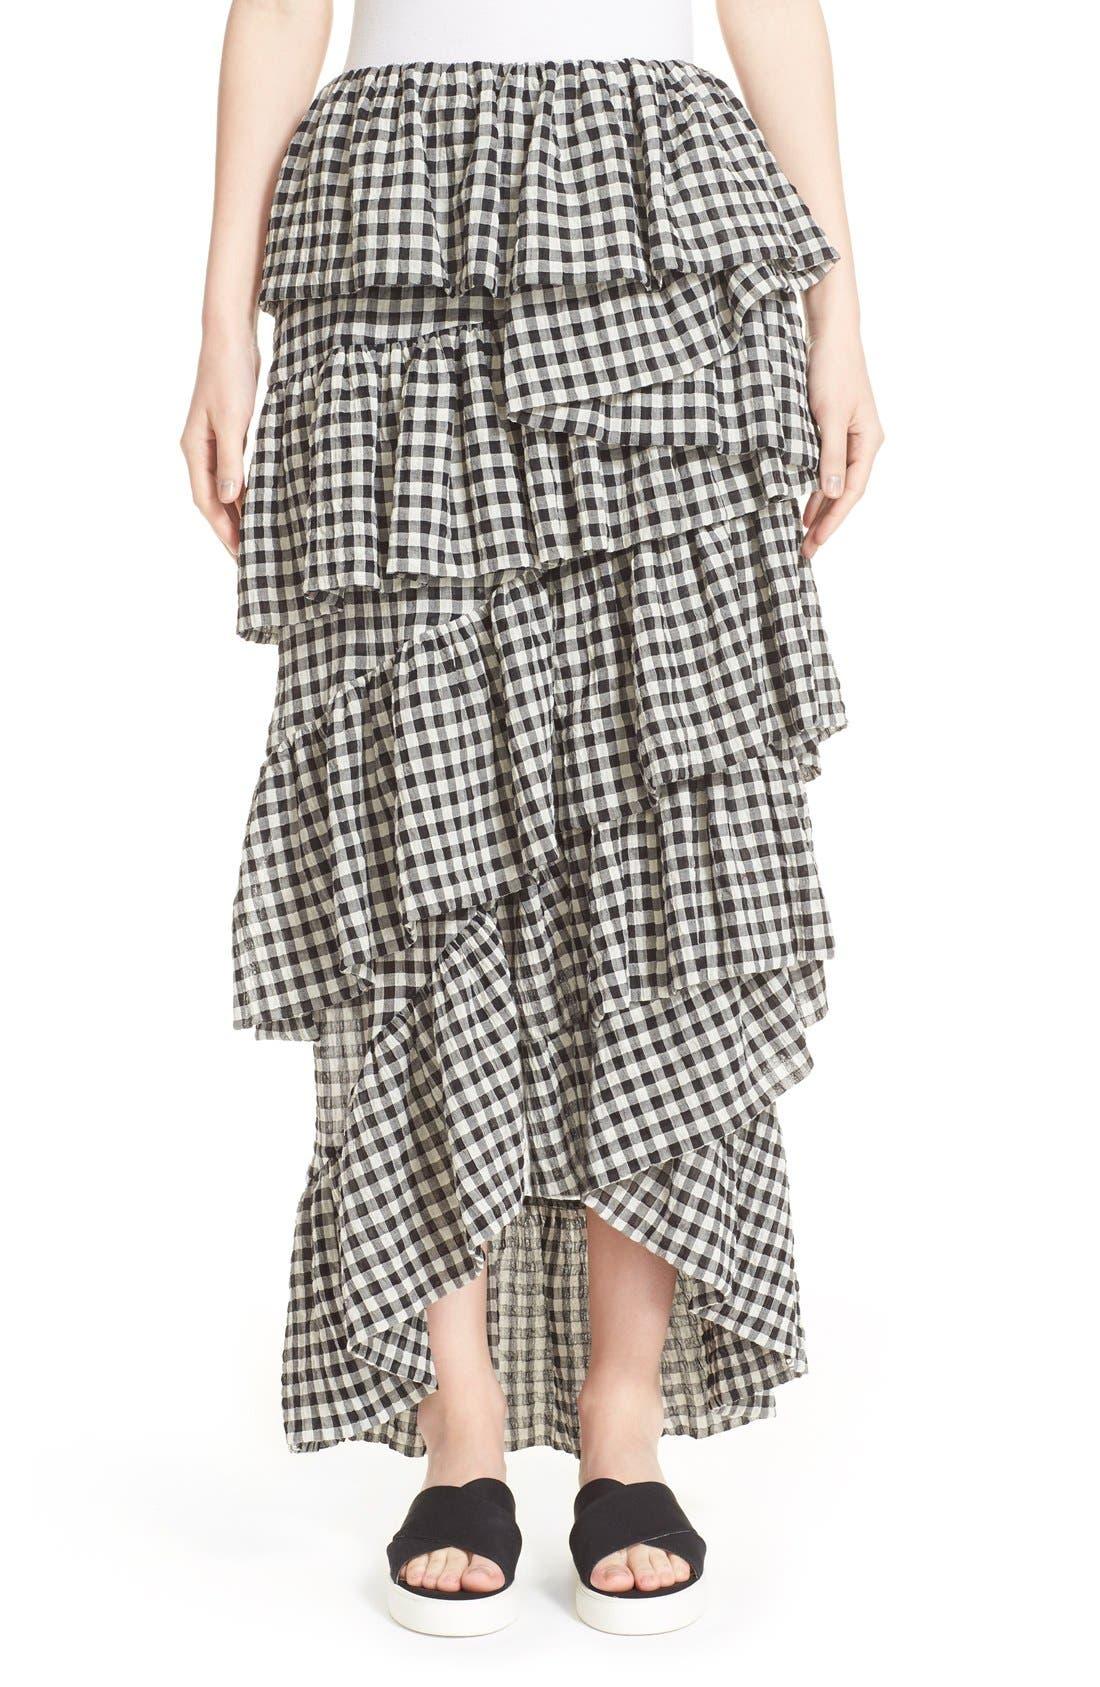 Alternate Image 1 Selected - Isa Arfen 'Full On' Tiered Ruffle Skirt